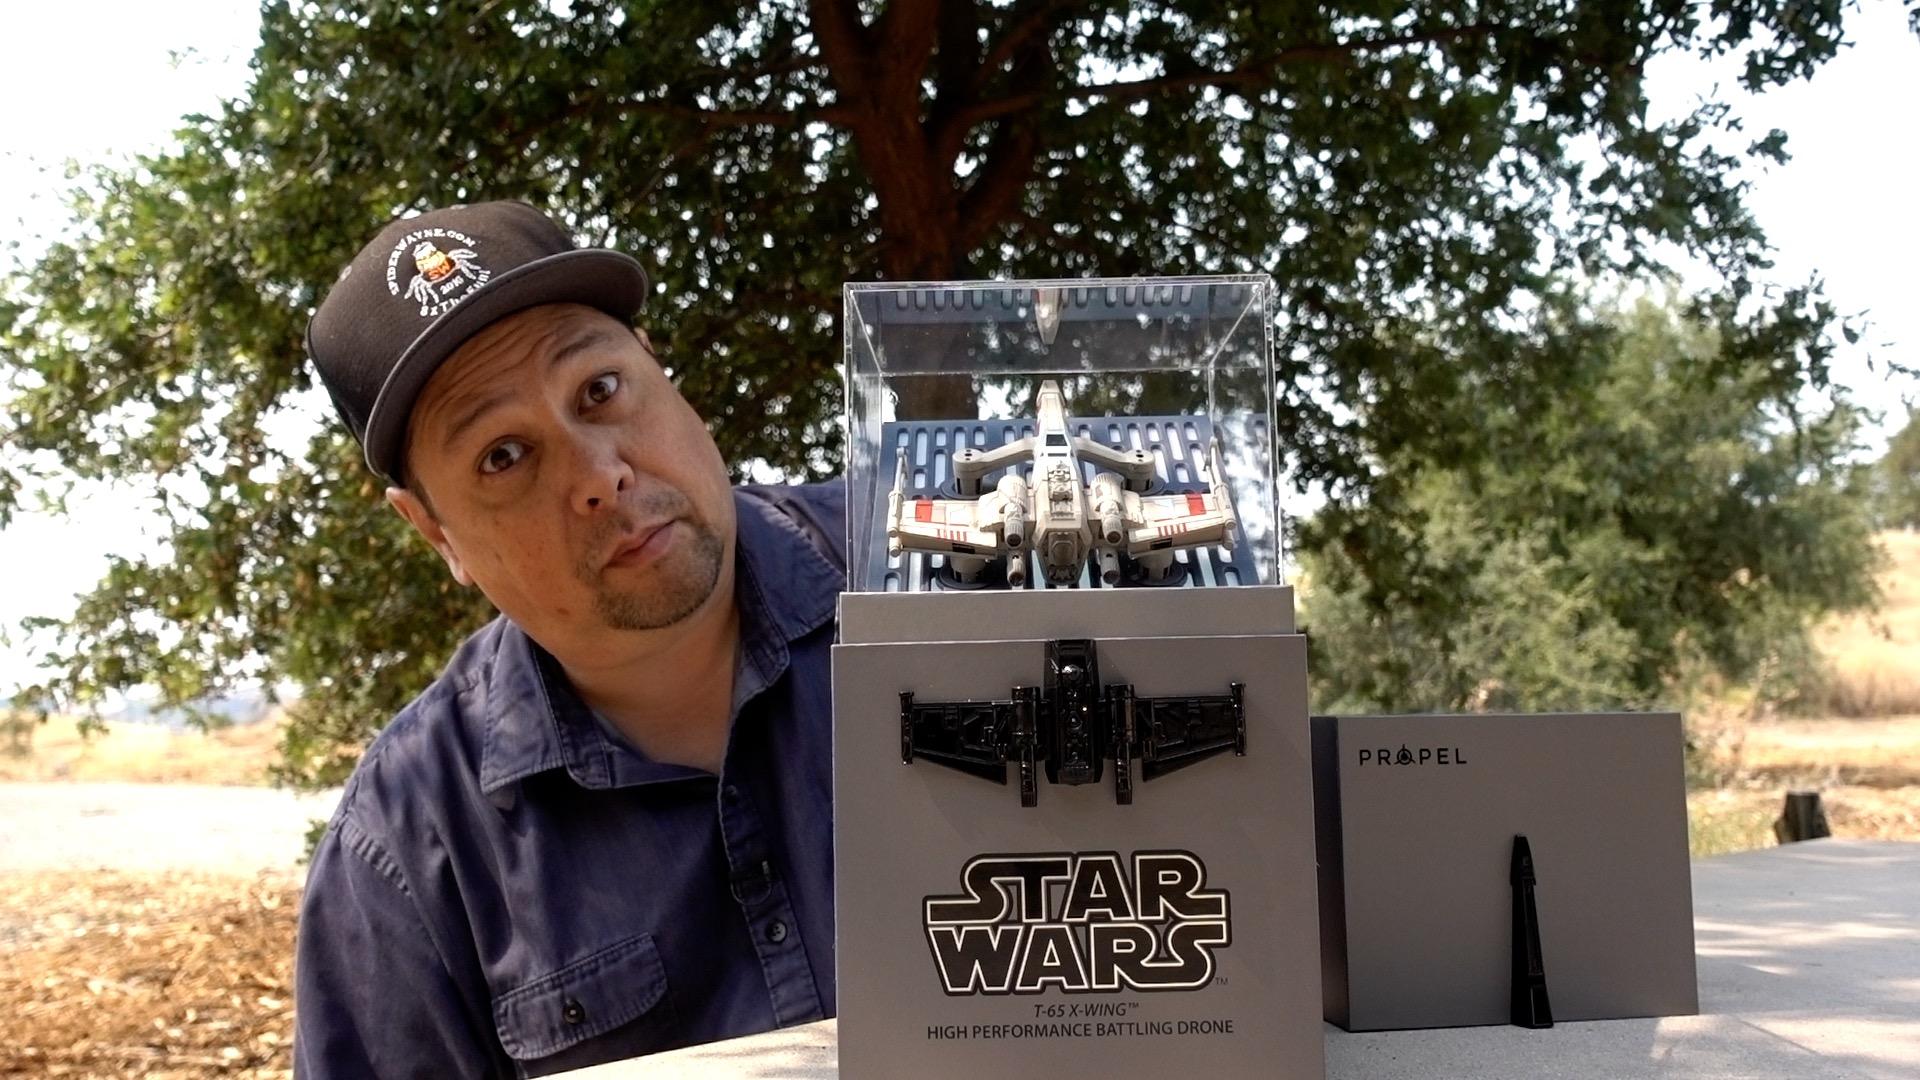 Star Wars Drones Giveaway